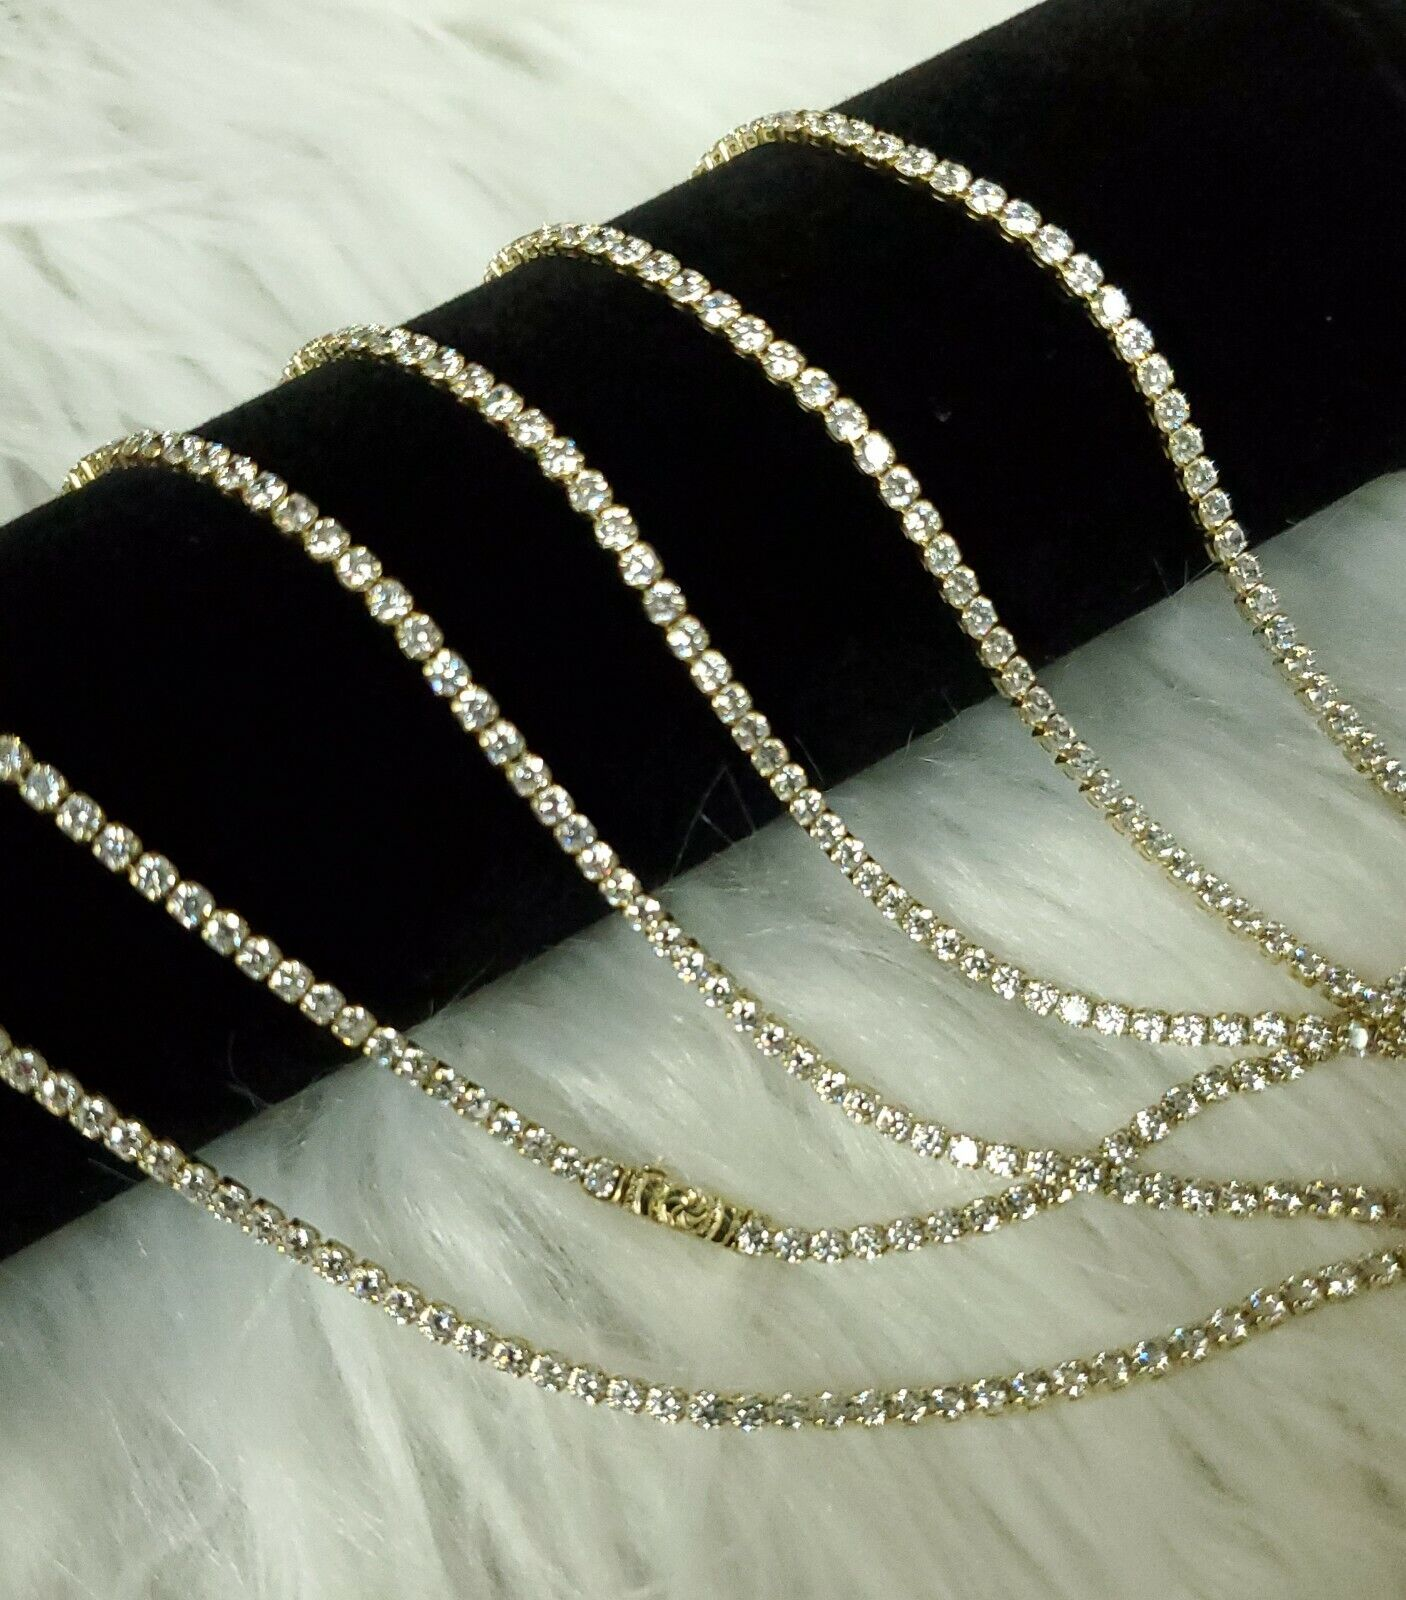 10k Genuine Yellow Gold 2mm Tennis Chain Bracelet Necklace Manmade Diamond Iced